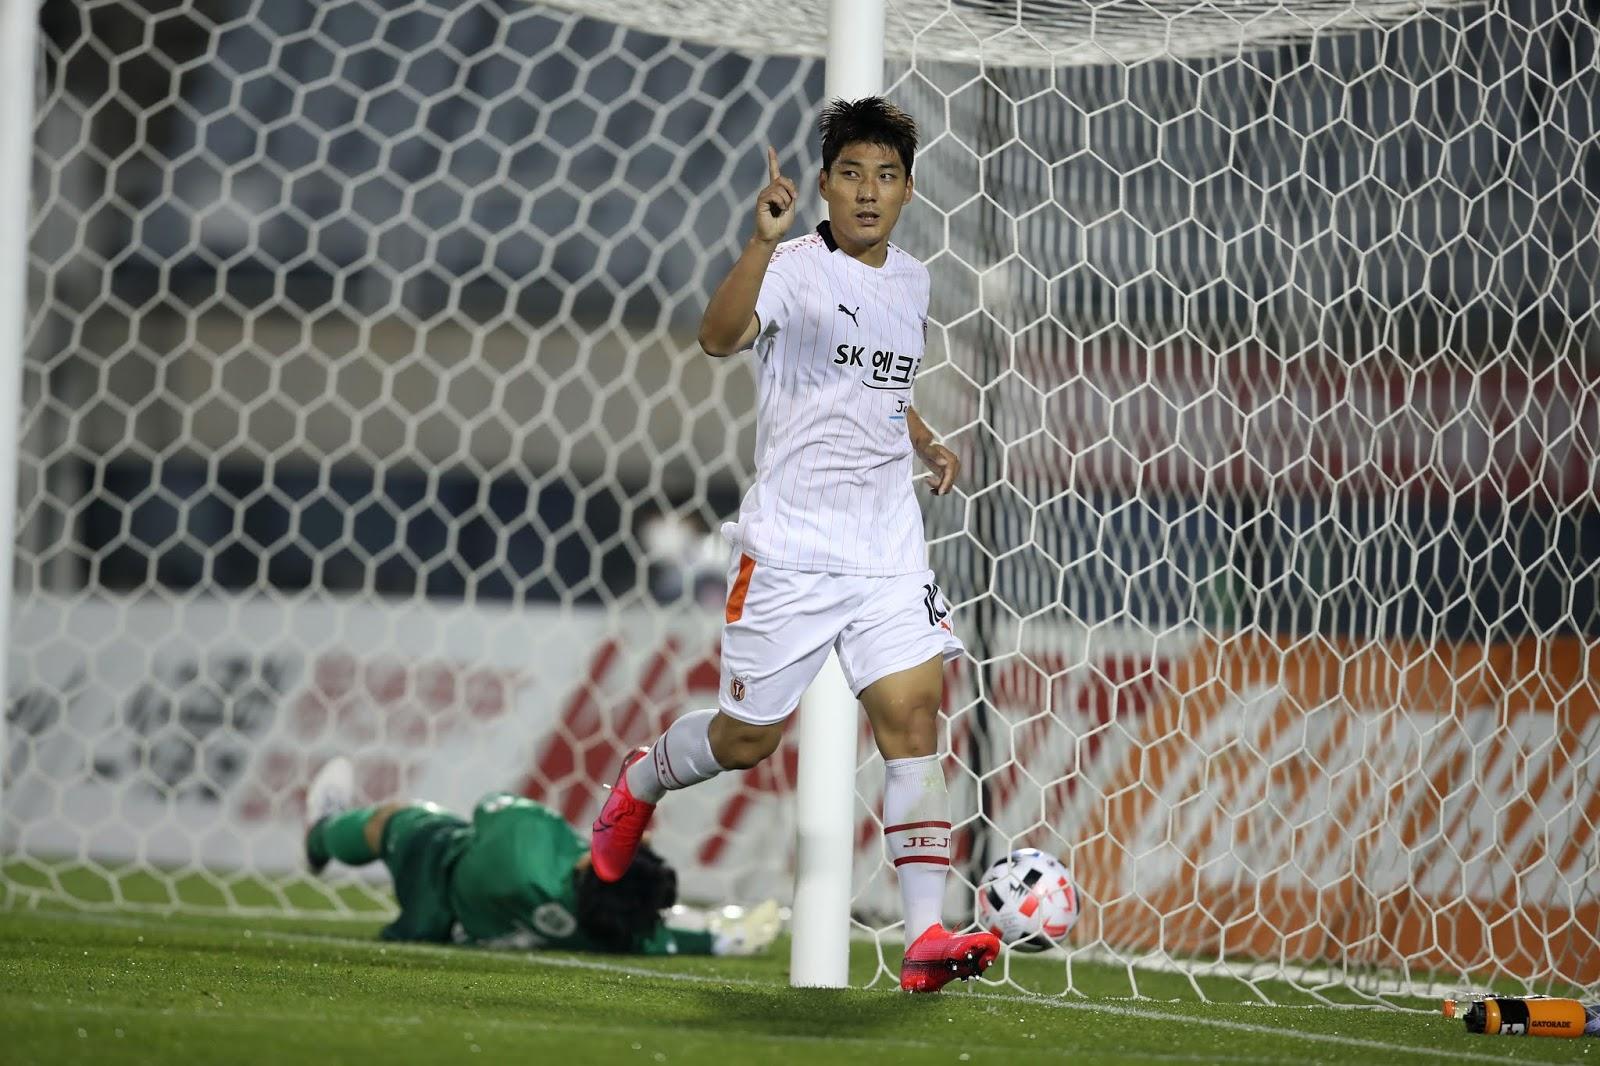 Joo Min-kyu scores against Bucheon. 05.26.20